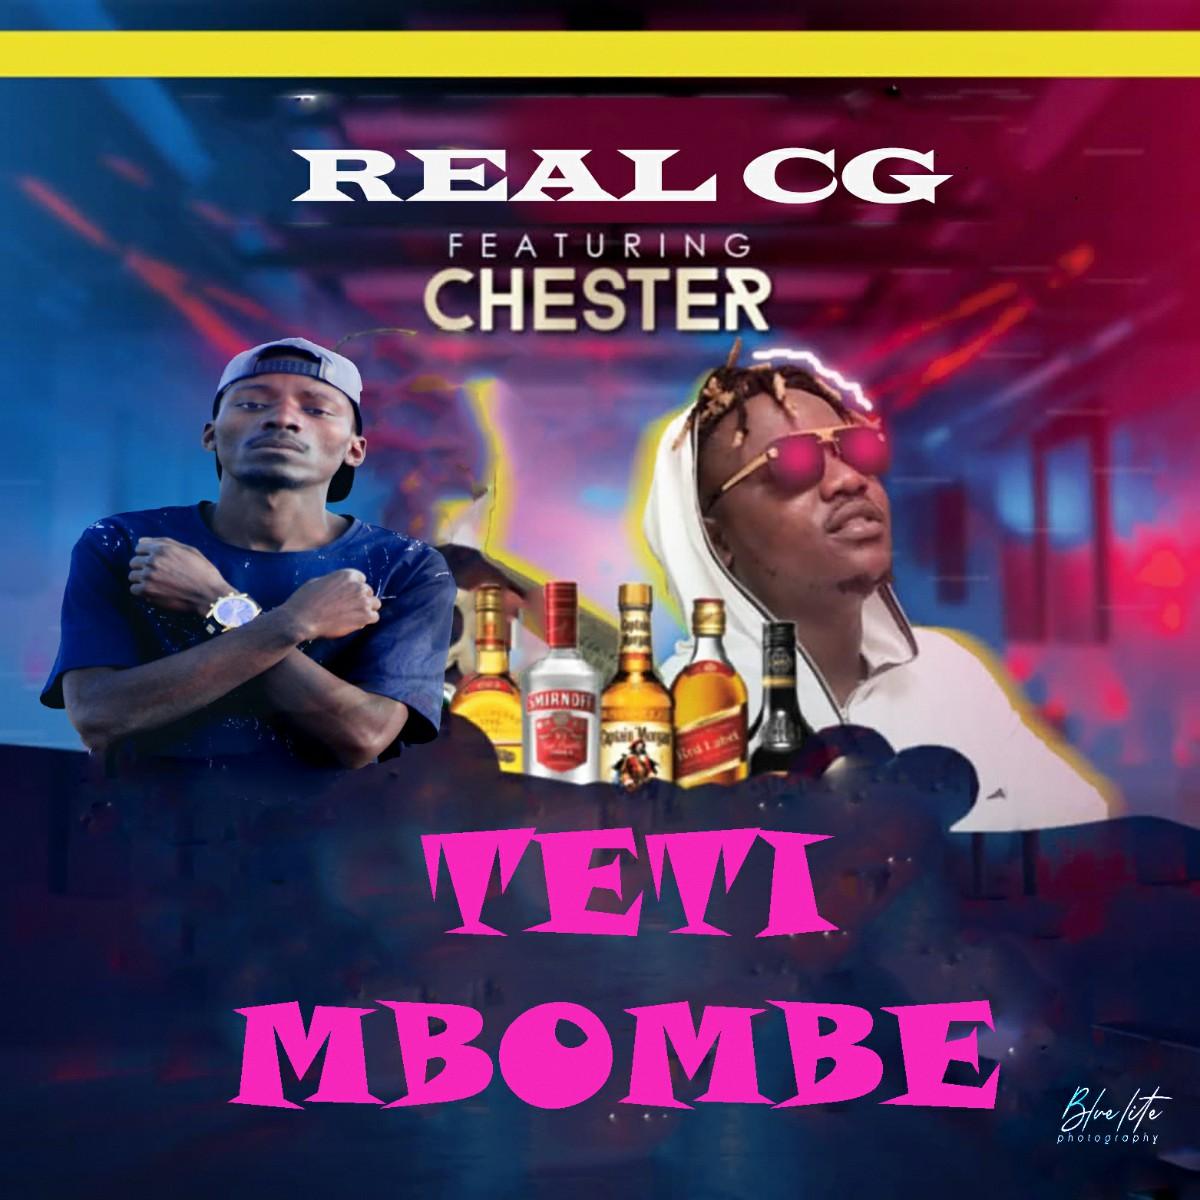 Real CG ft. Chester - Teti Mbombe